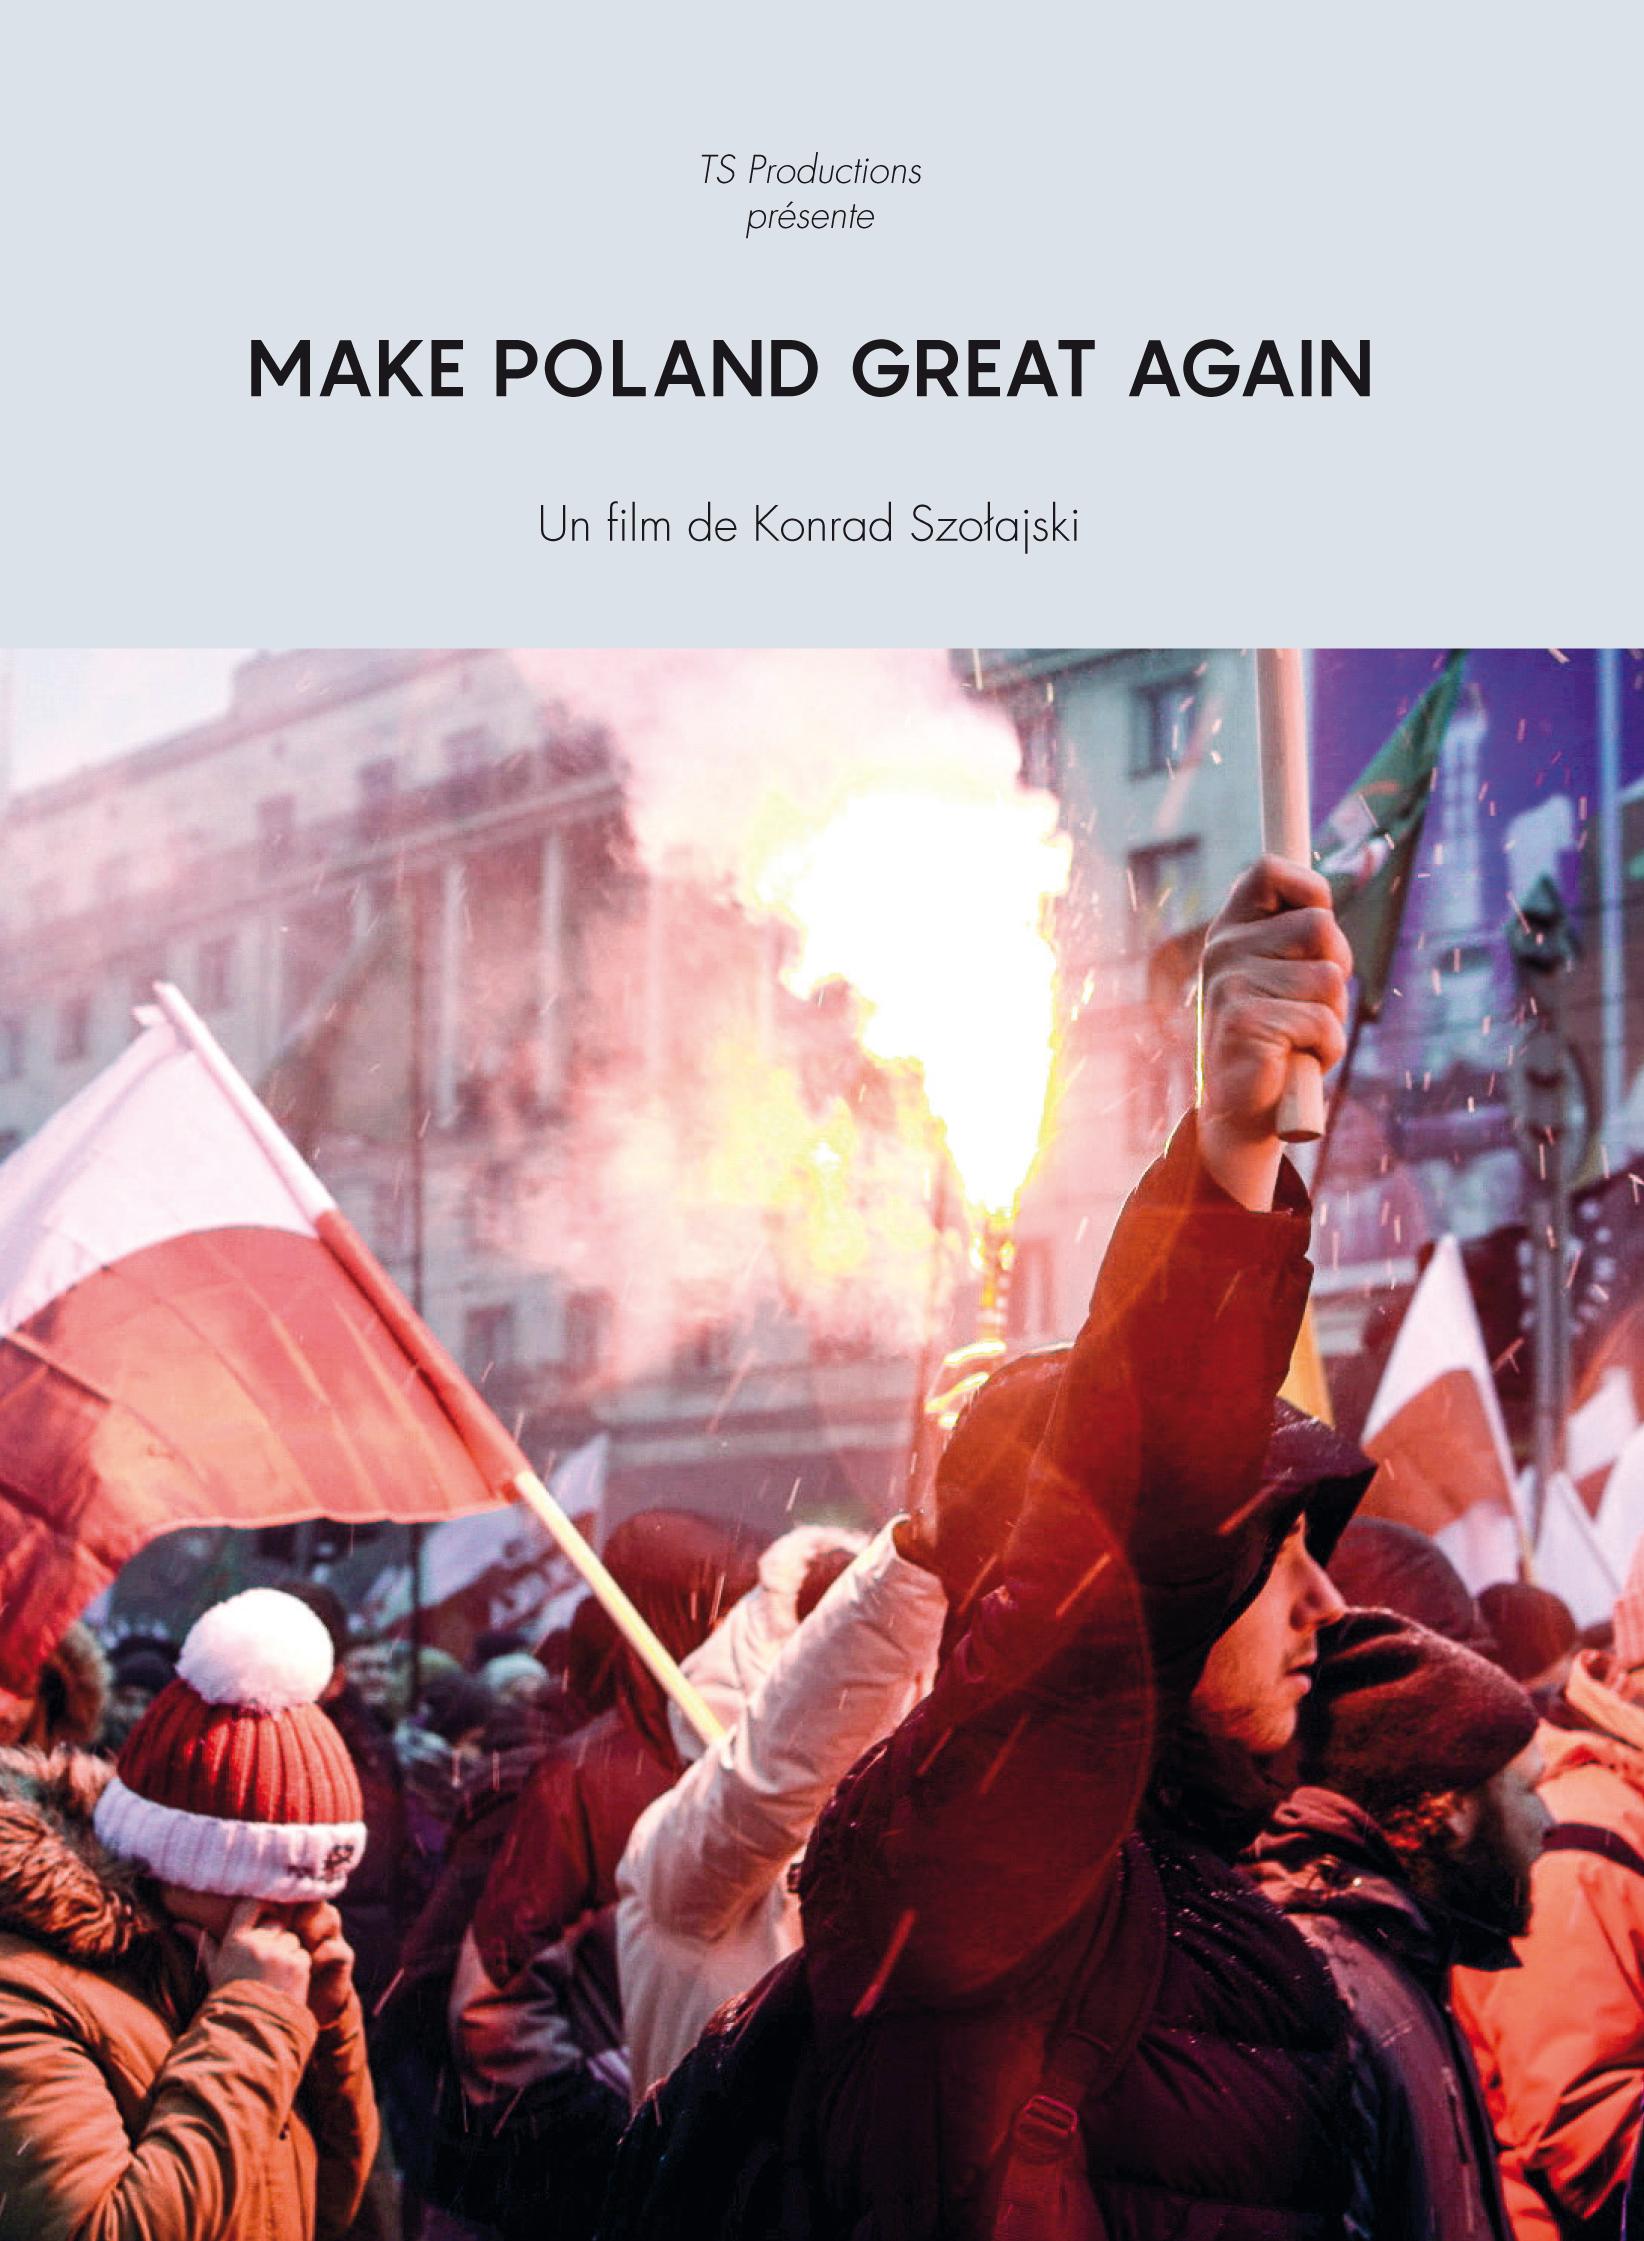 MAKE POLAND GREAT AGAIN - Konrad Szołajski